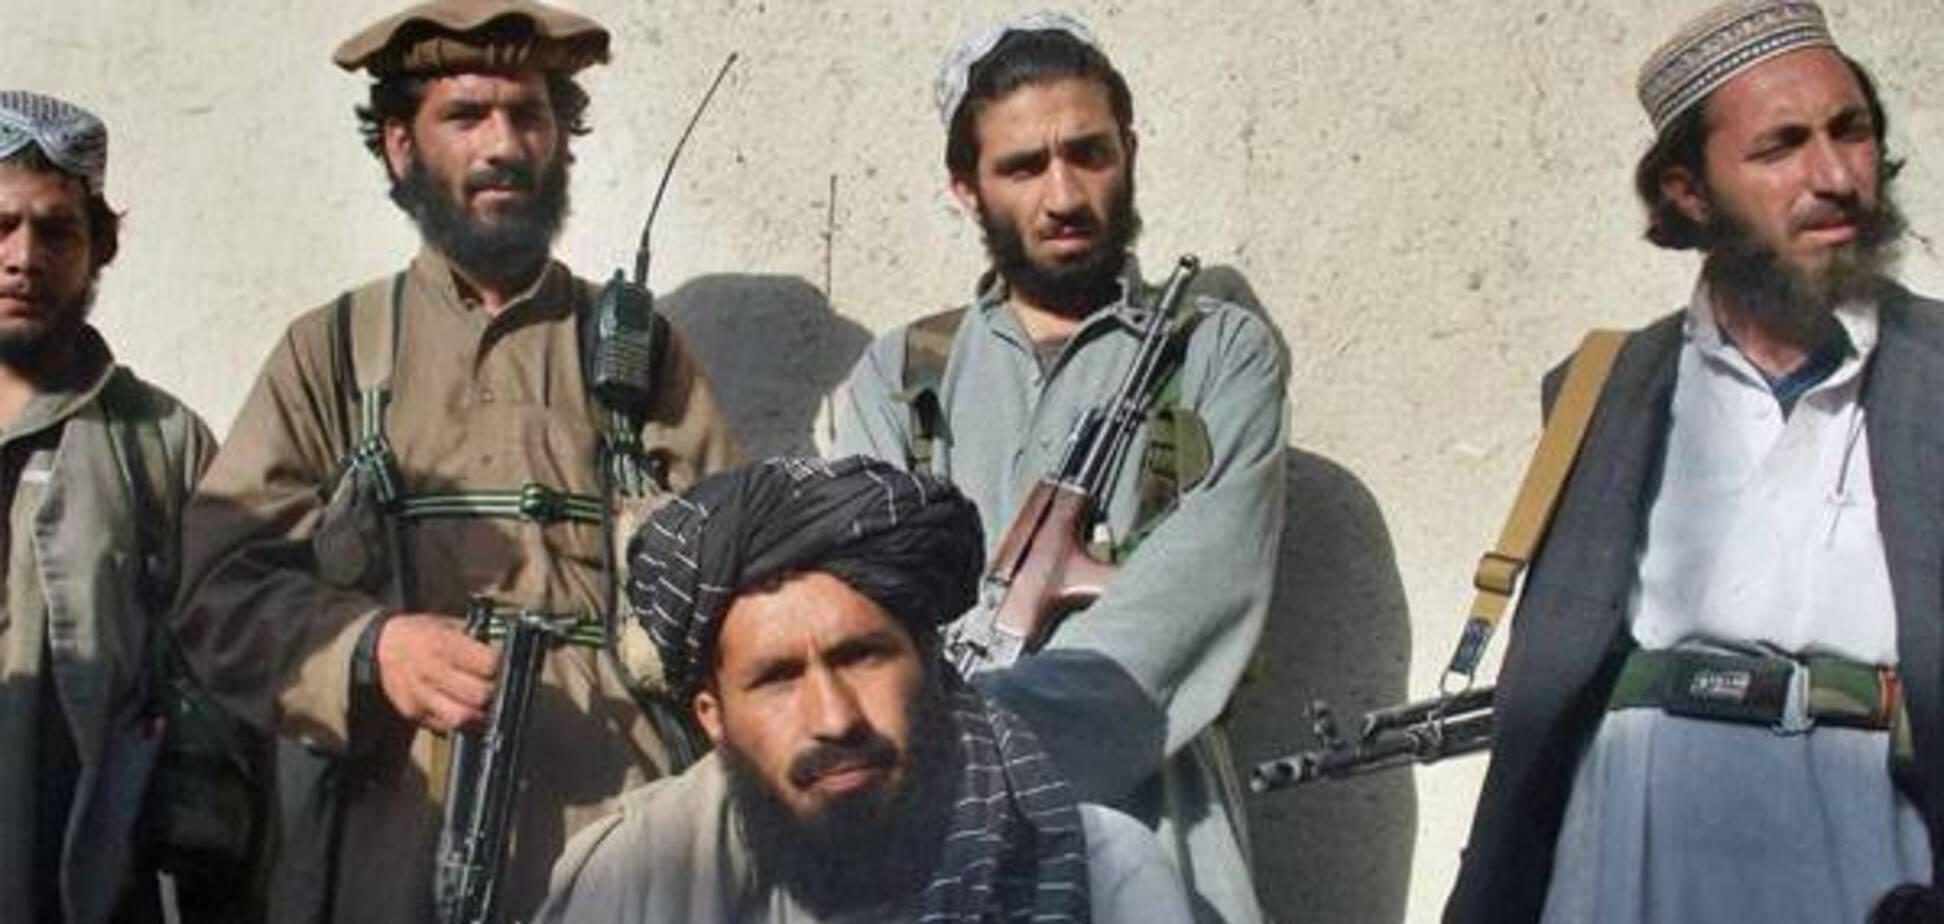 'Талибан' устроил кровавую бойню в Афганистане